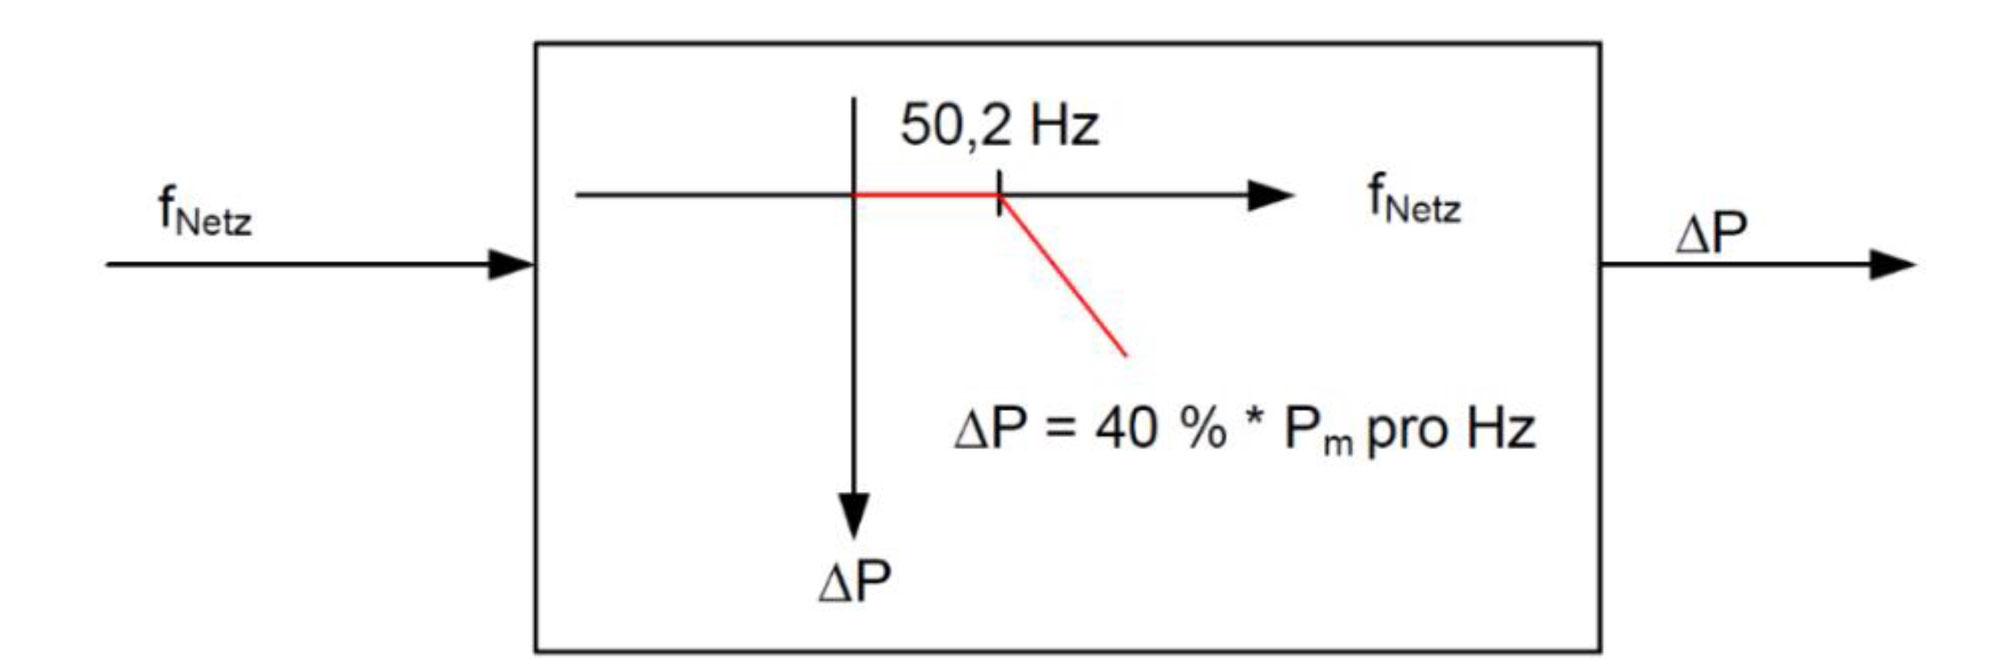 50.2 Hz Retrofit